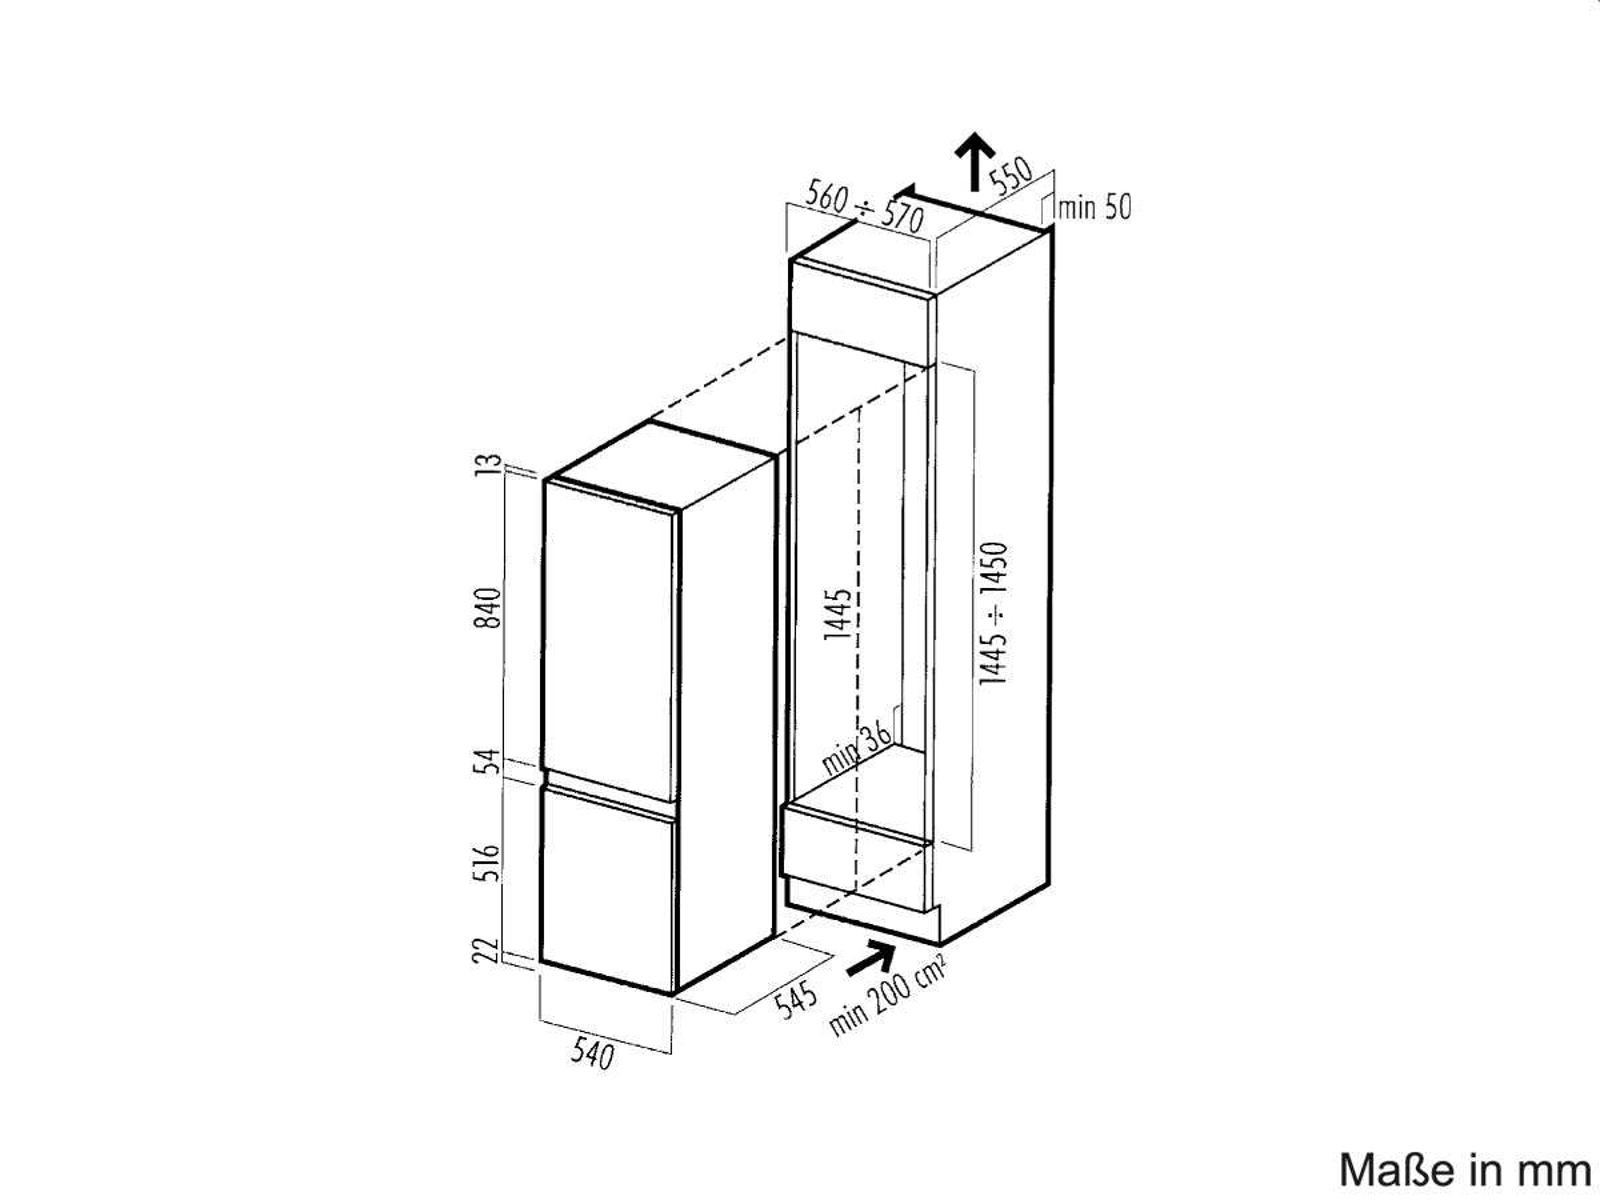 whirlpool arg 316 a einbau k hl gefrierkombination. Black Bedroom Furniture Sets. Home Design Ideas